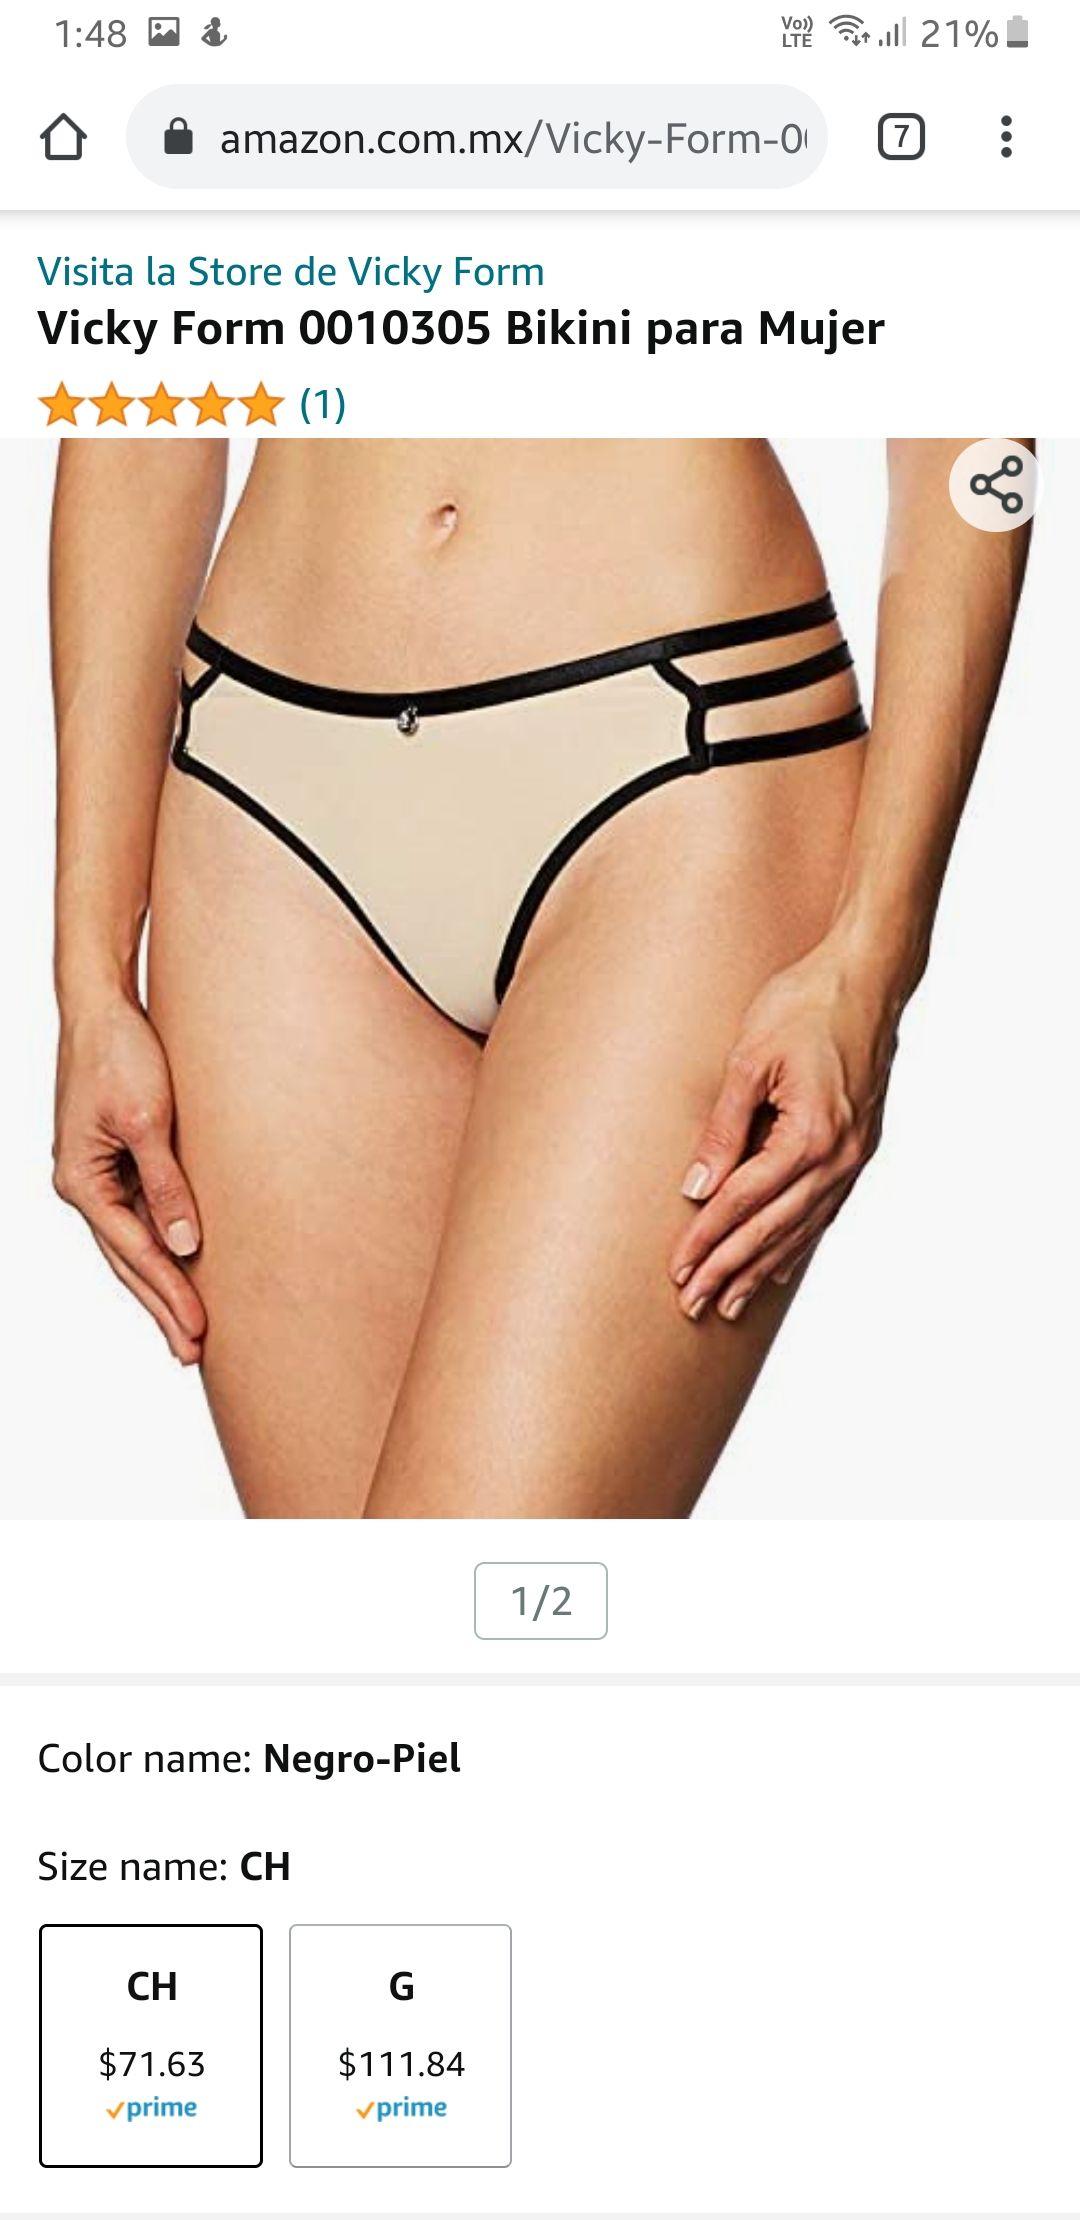 Amazon: Vicky Form Bikini talla chica